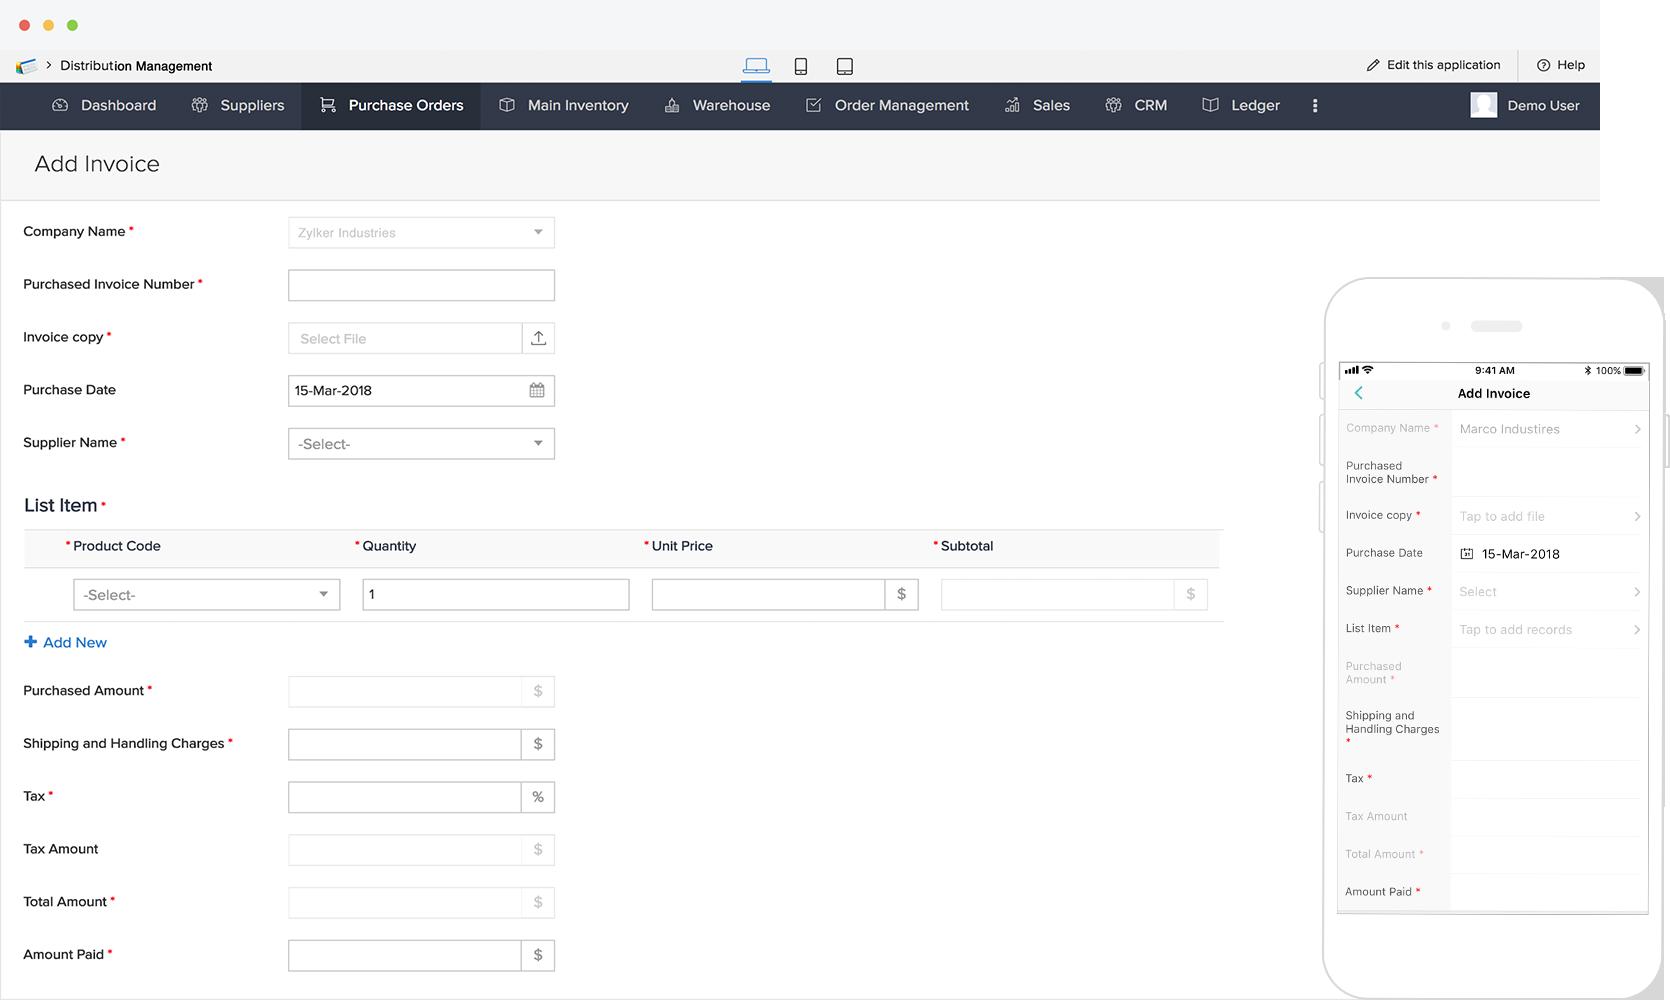 Free distribution management software | Customizable